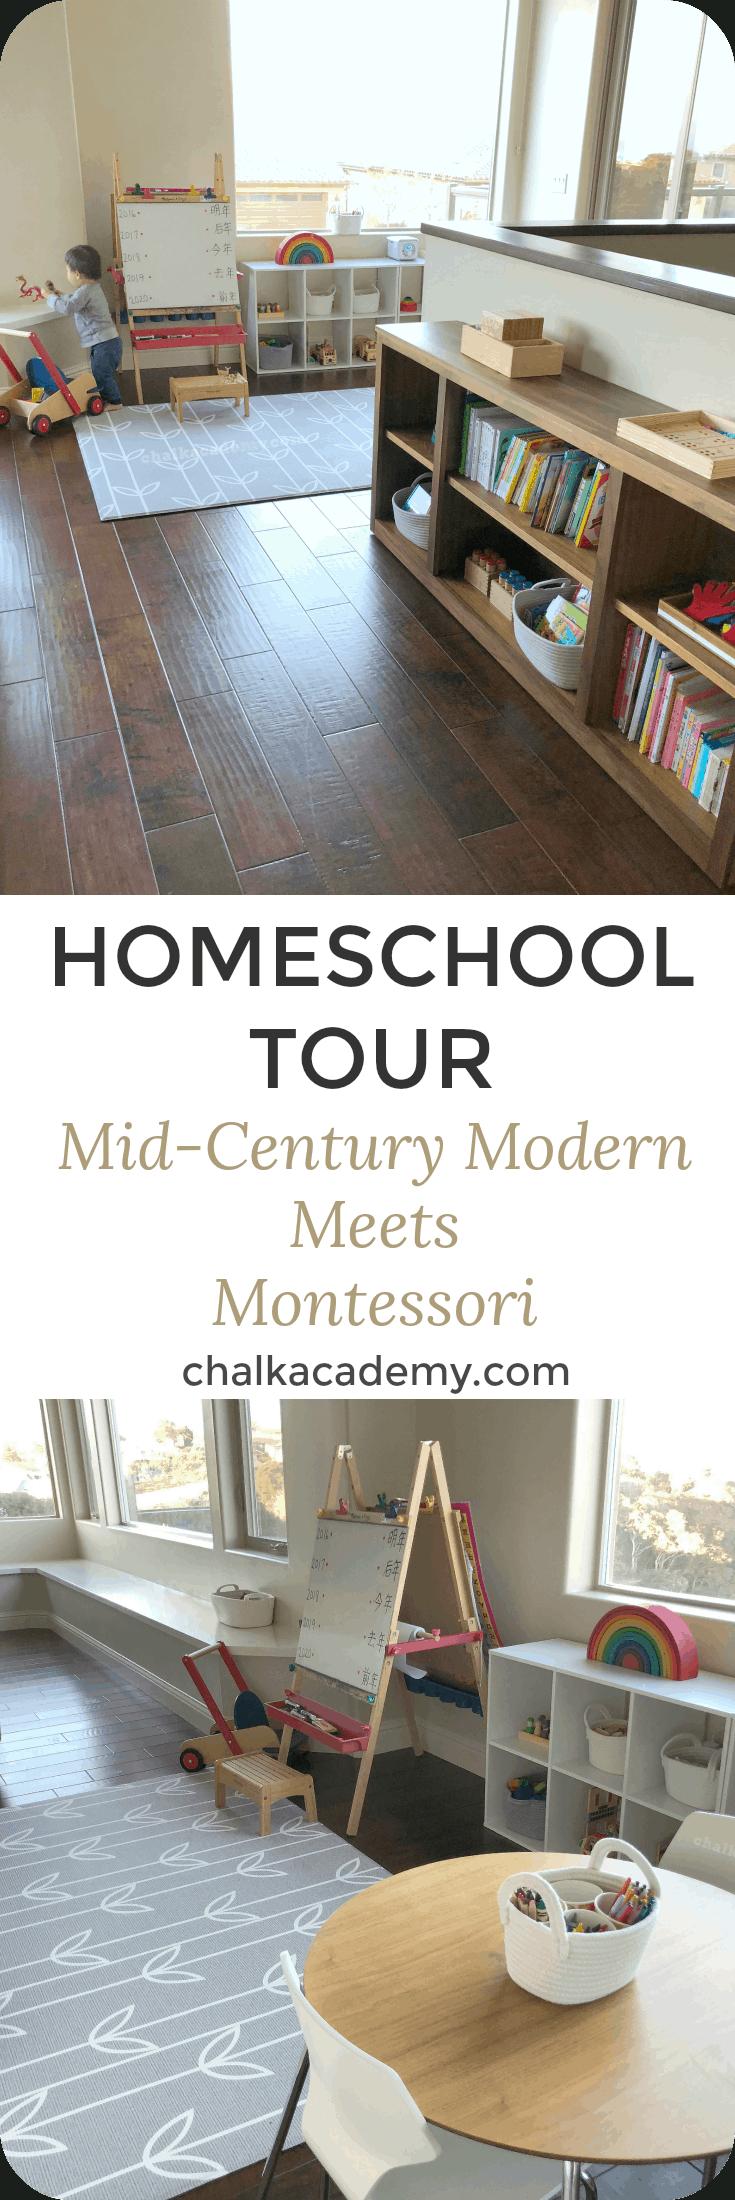 Homeschool Tour: Mid-Century Modern Meets Montessori; Open-concept living space | Shared playroom | Minimalist | Kon Mari | Preschool | Classroom | Prepared environment | Practical Life Skills | Playroom | Play area | Room & Board furniture